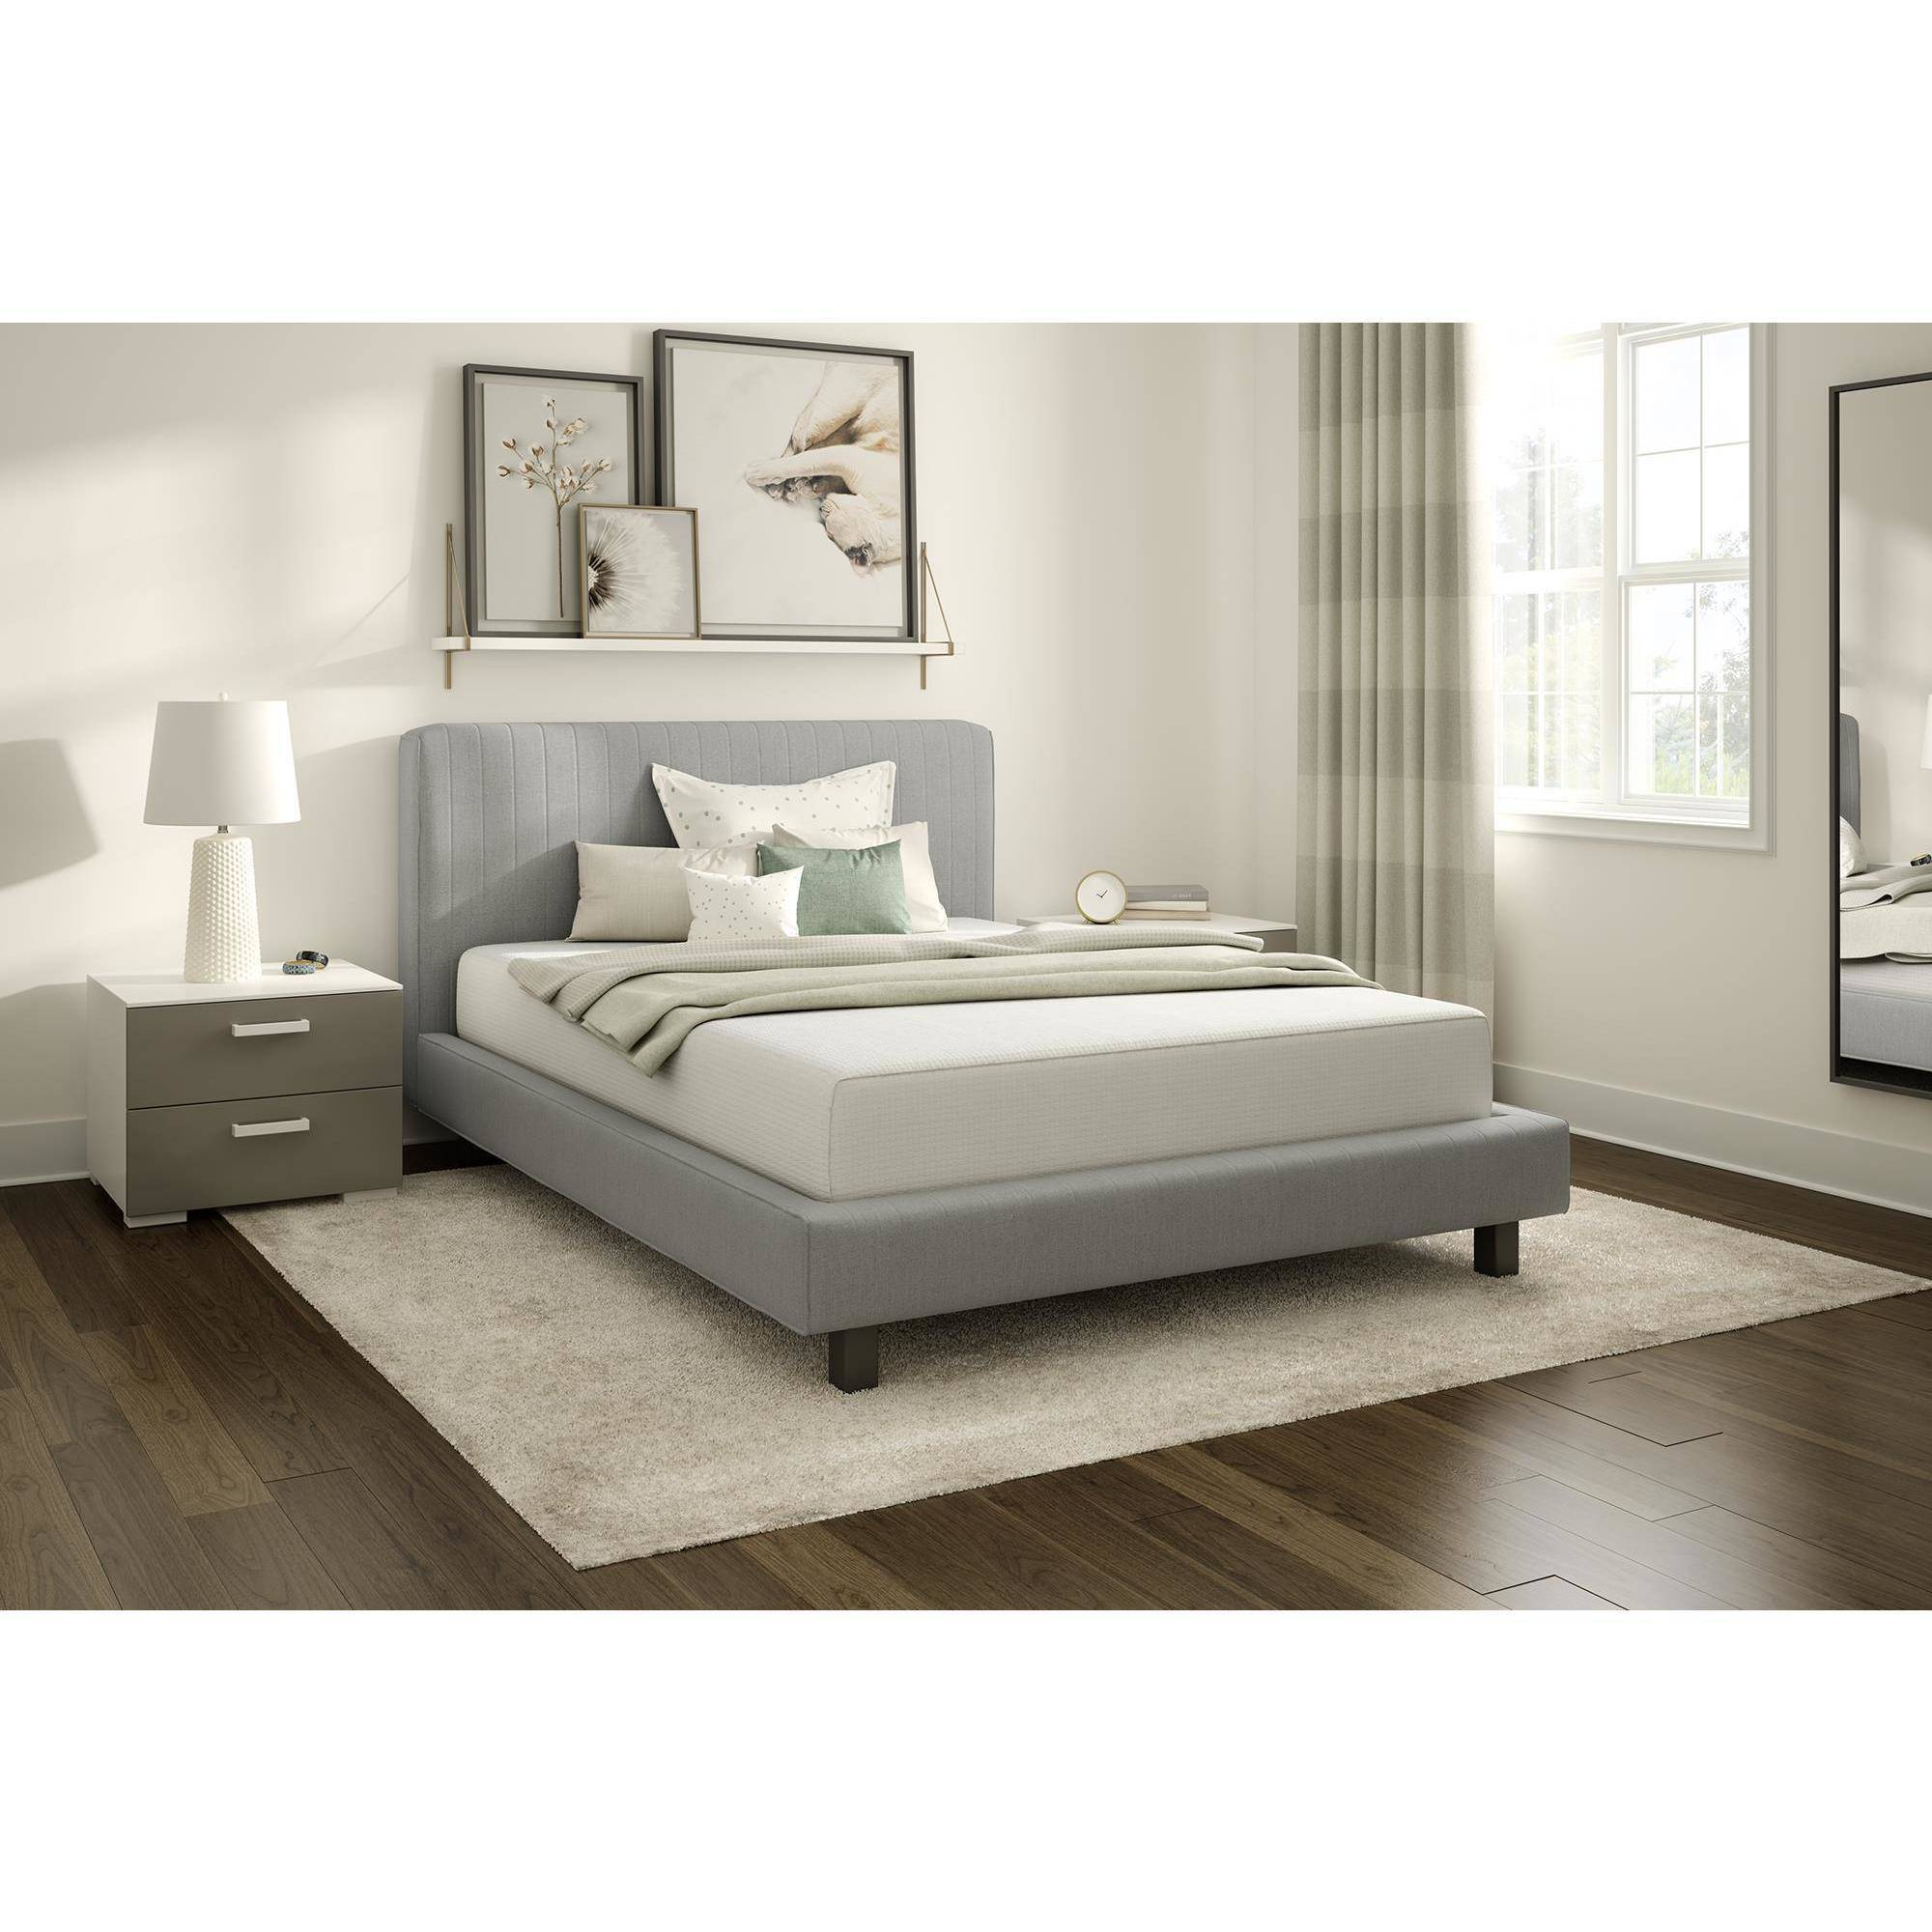 "Signature Sleep Gold CertiPUR-US Inspire 10"" Memory Foam Mattress, Multiple Sizes"